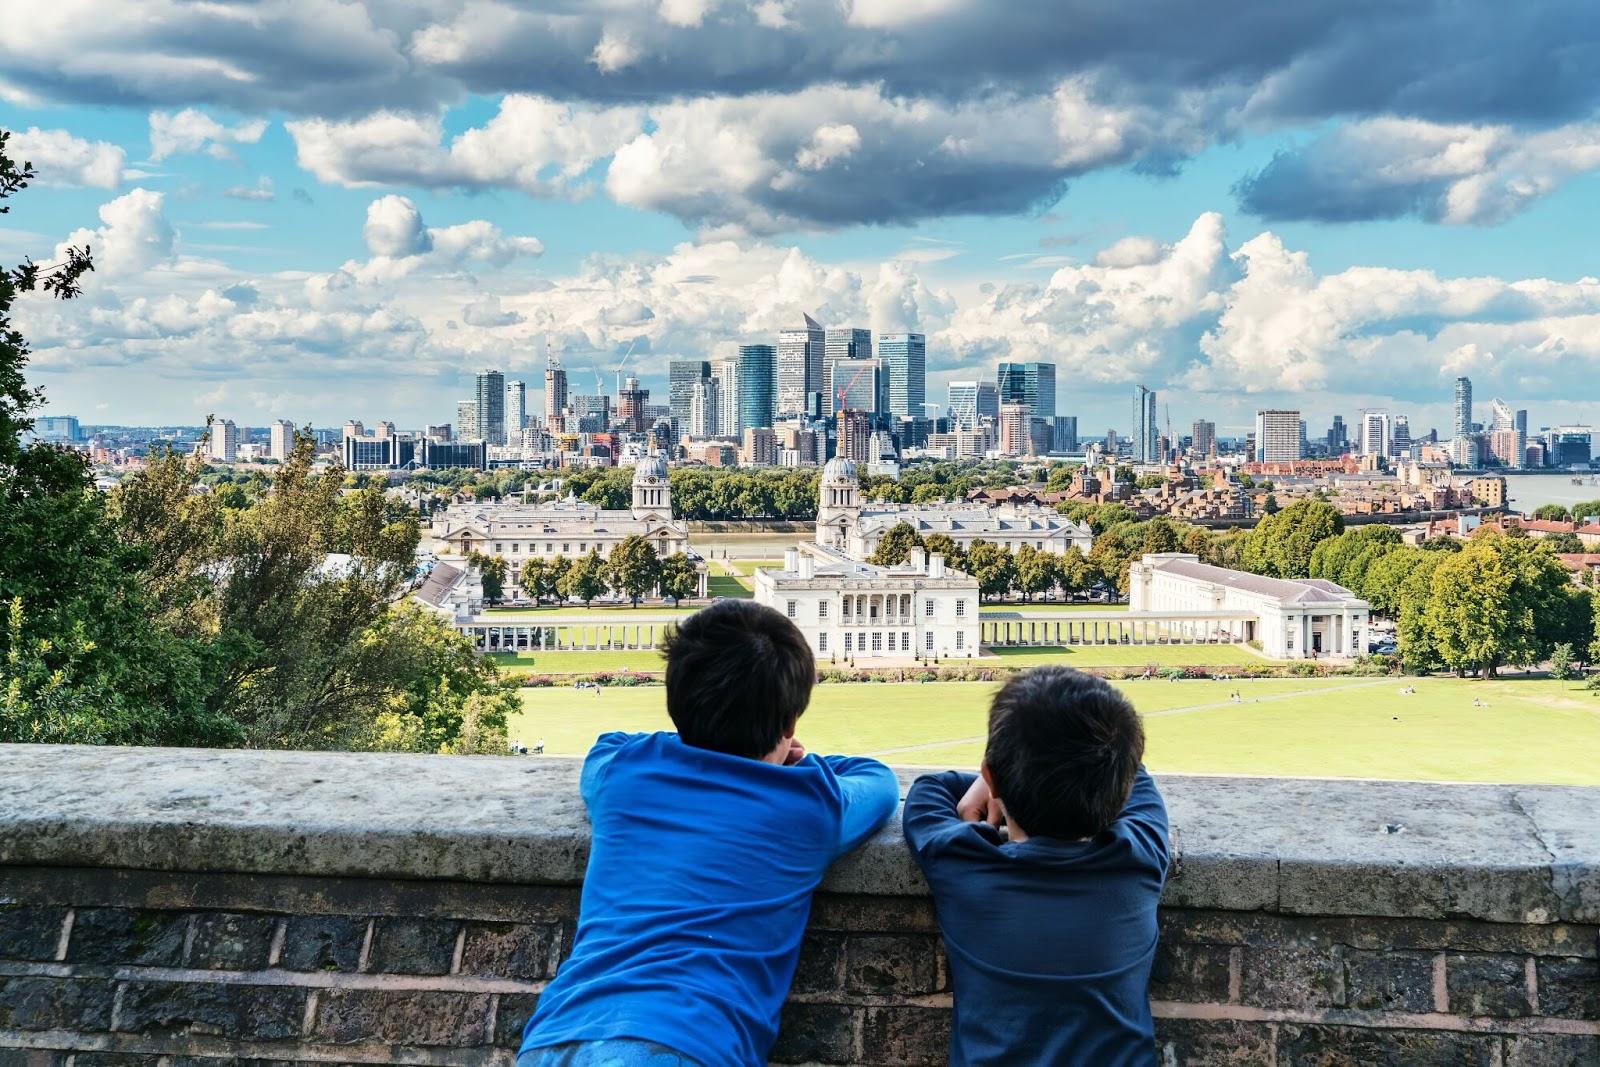 Parks help in building safer neighborhoods